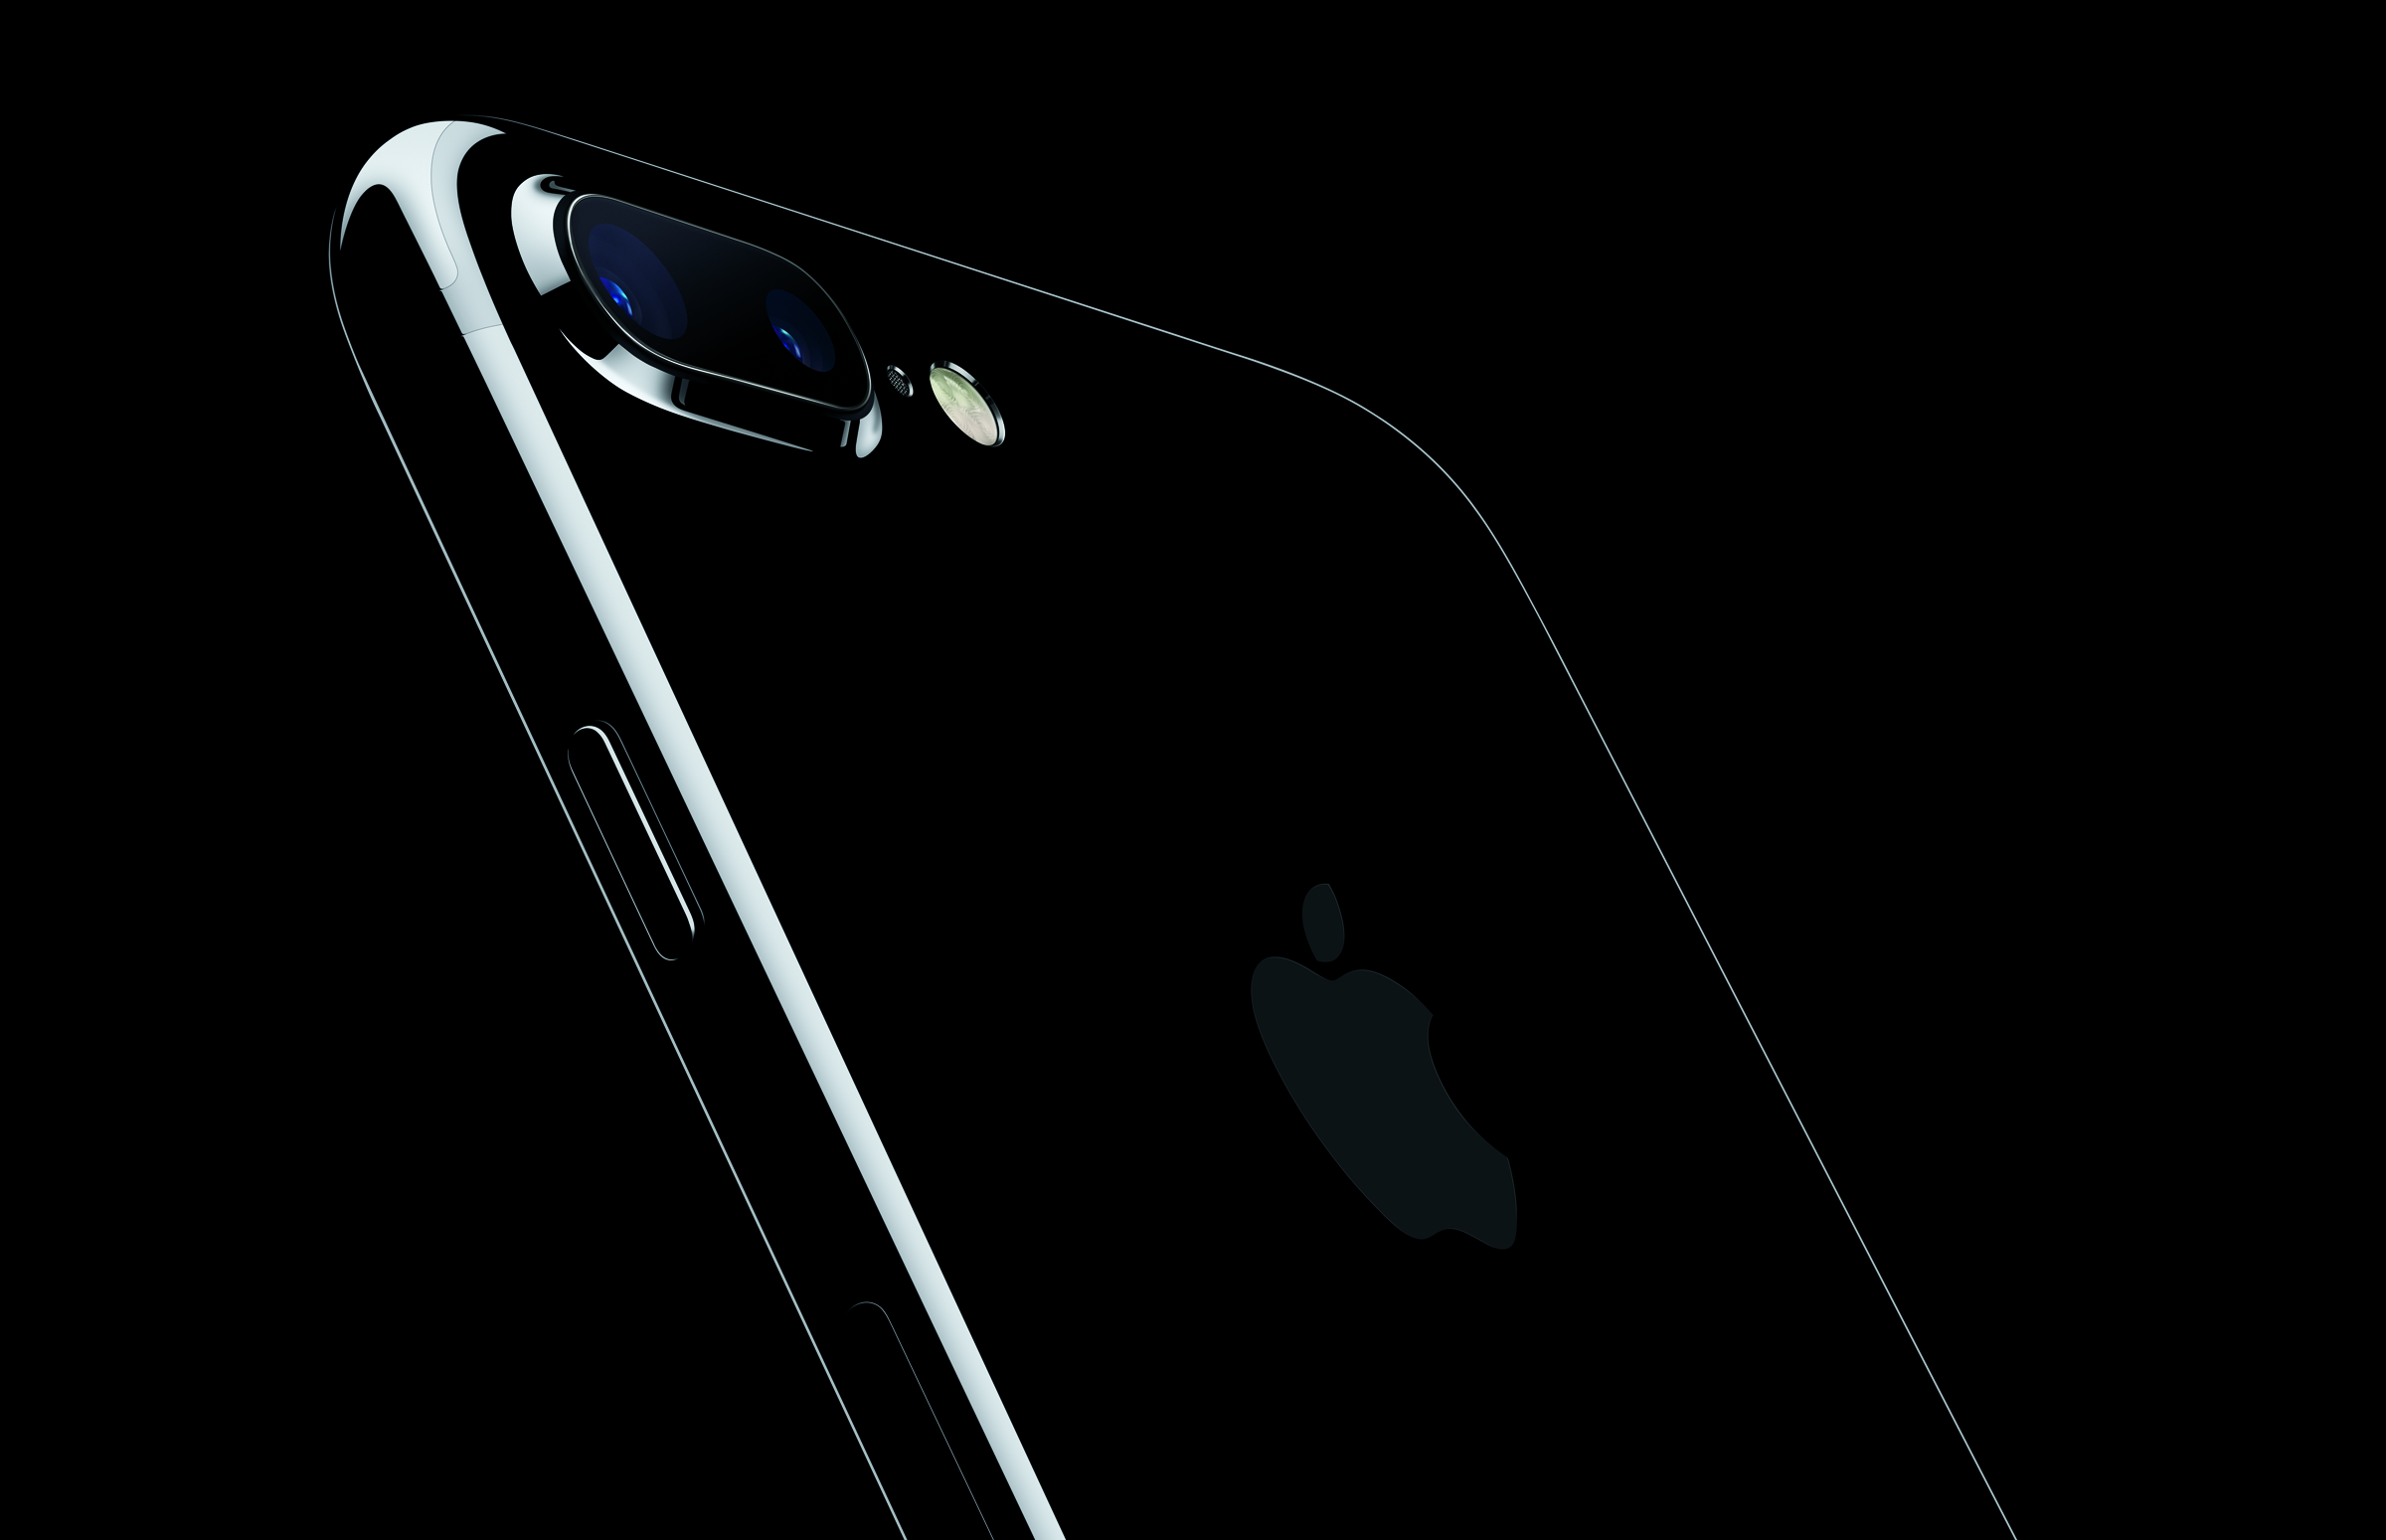 iPhone7Plus-JetBlk-34BR-LeanForward